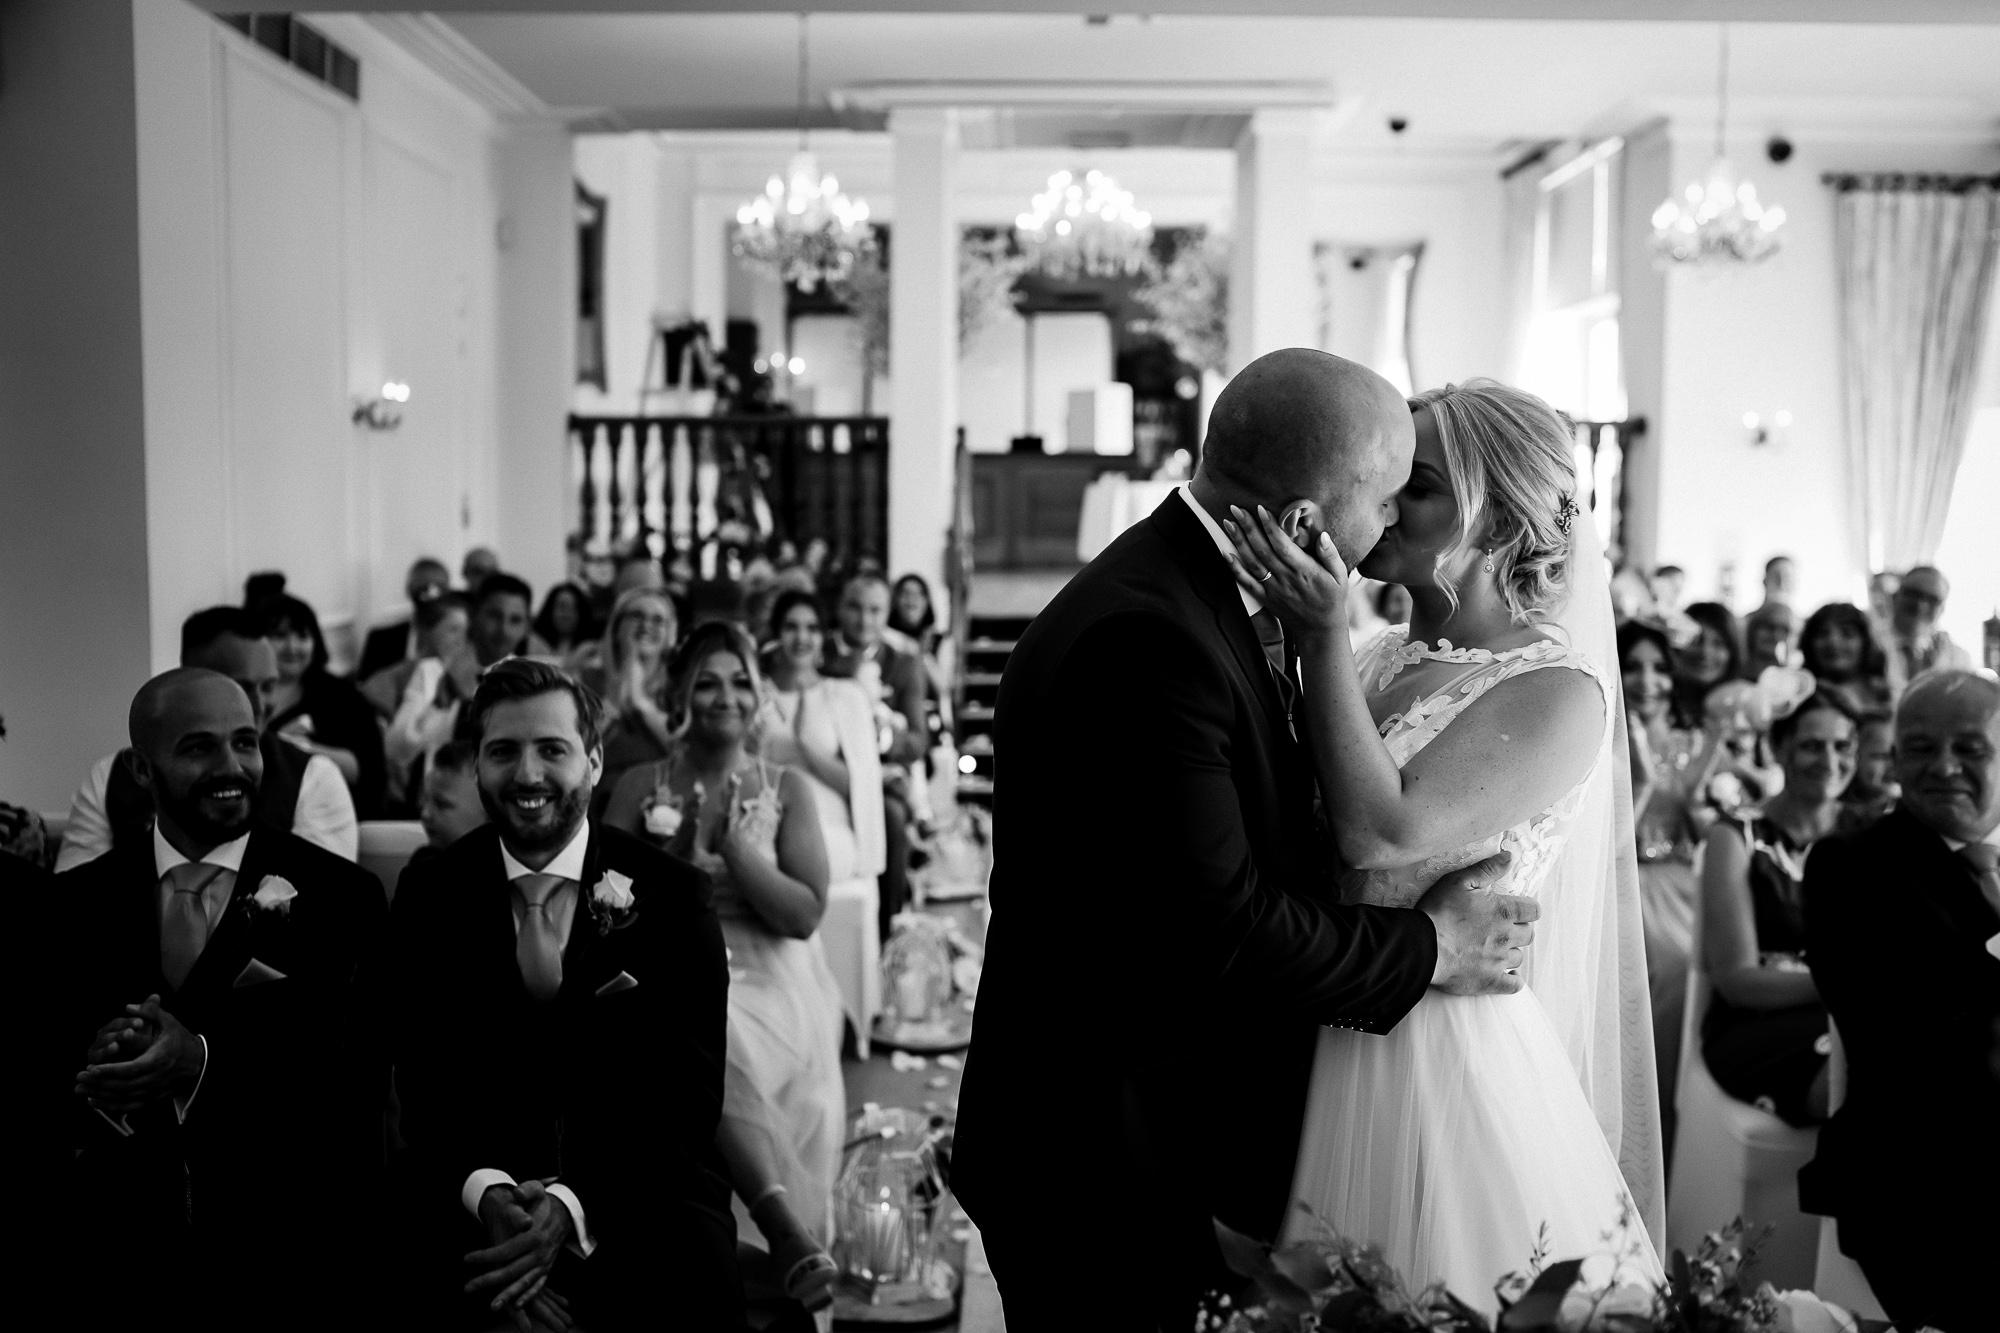 West Tower Wedding Photographer Ormskirk Lancashire wedding photography (25 of 57).jpg